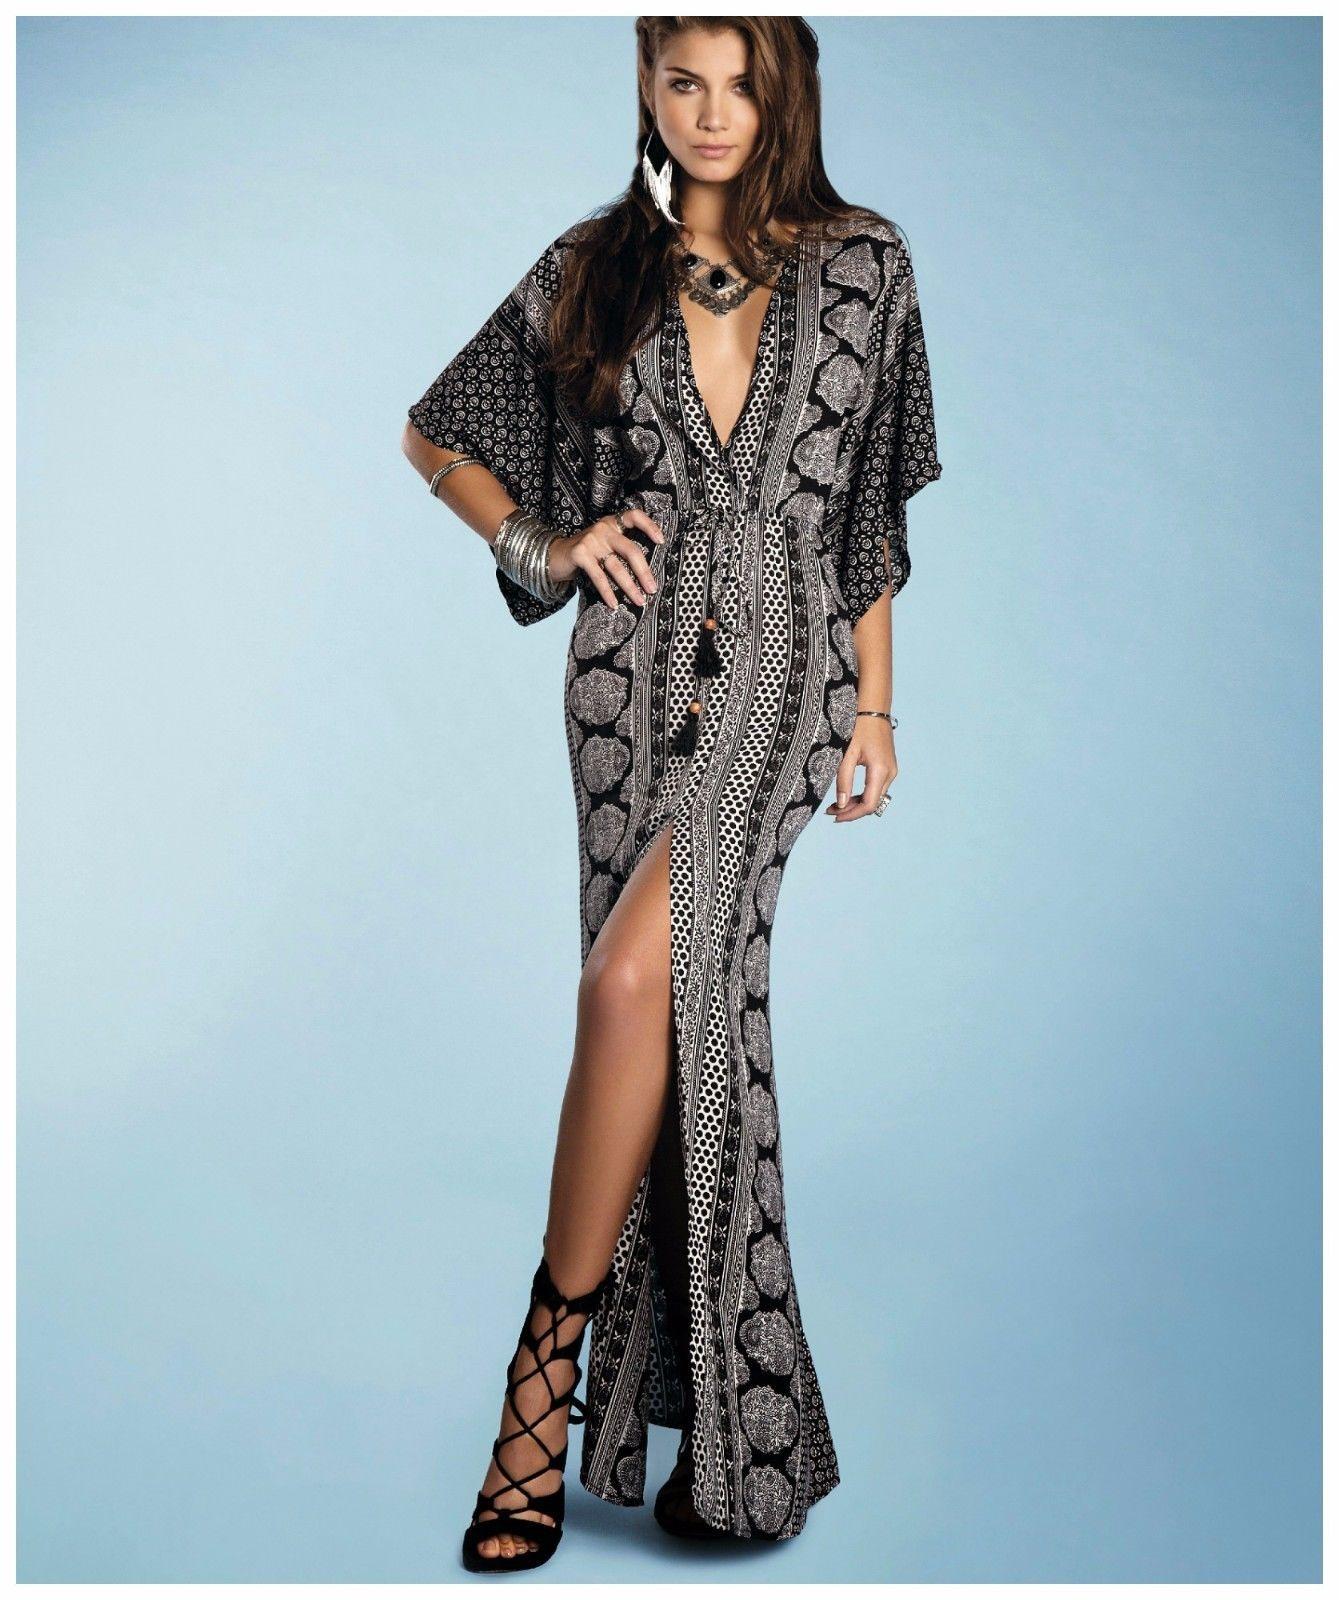 89e7b90b22 Elan Boho Paisley Sexy Black White Gypsy Kaftan Maxi Dress Deep V Front  Slit | eBay